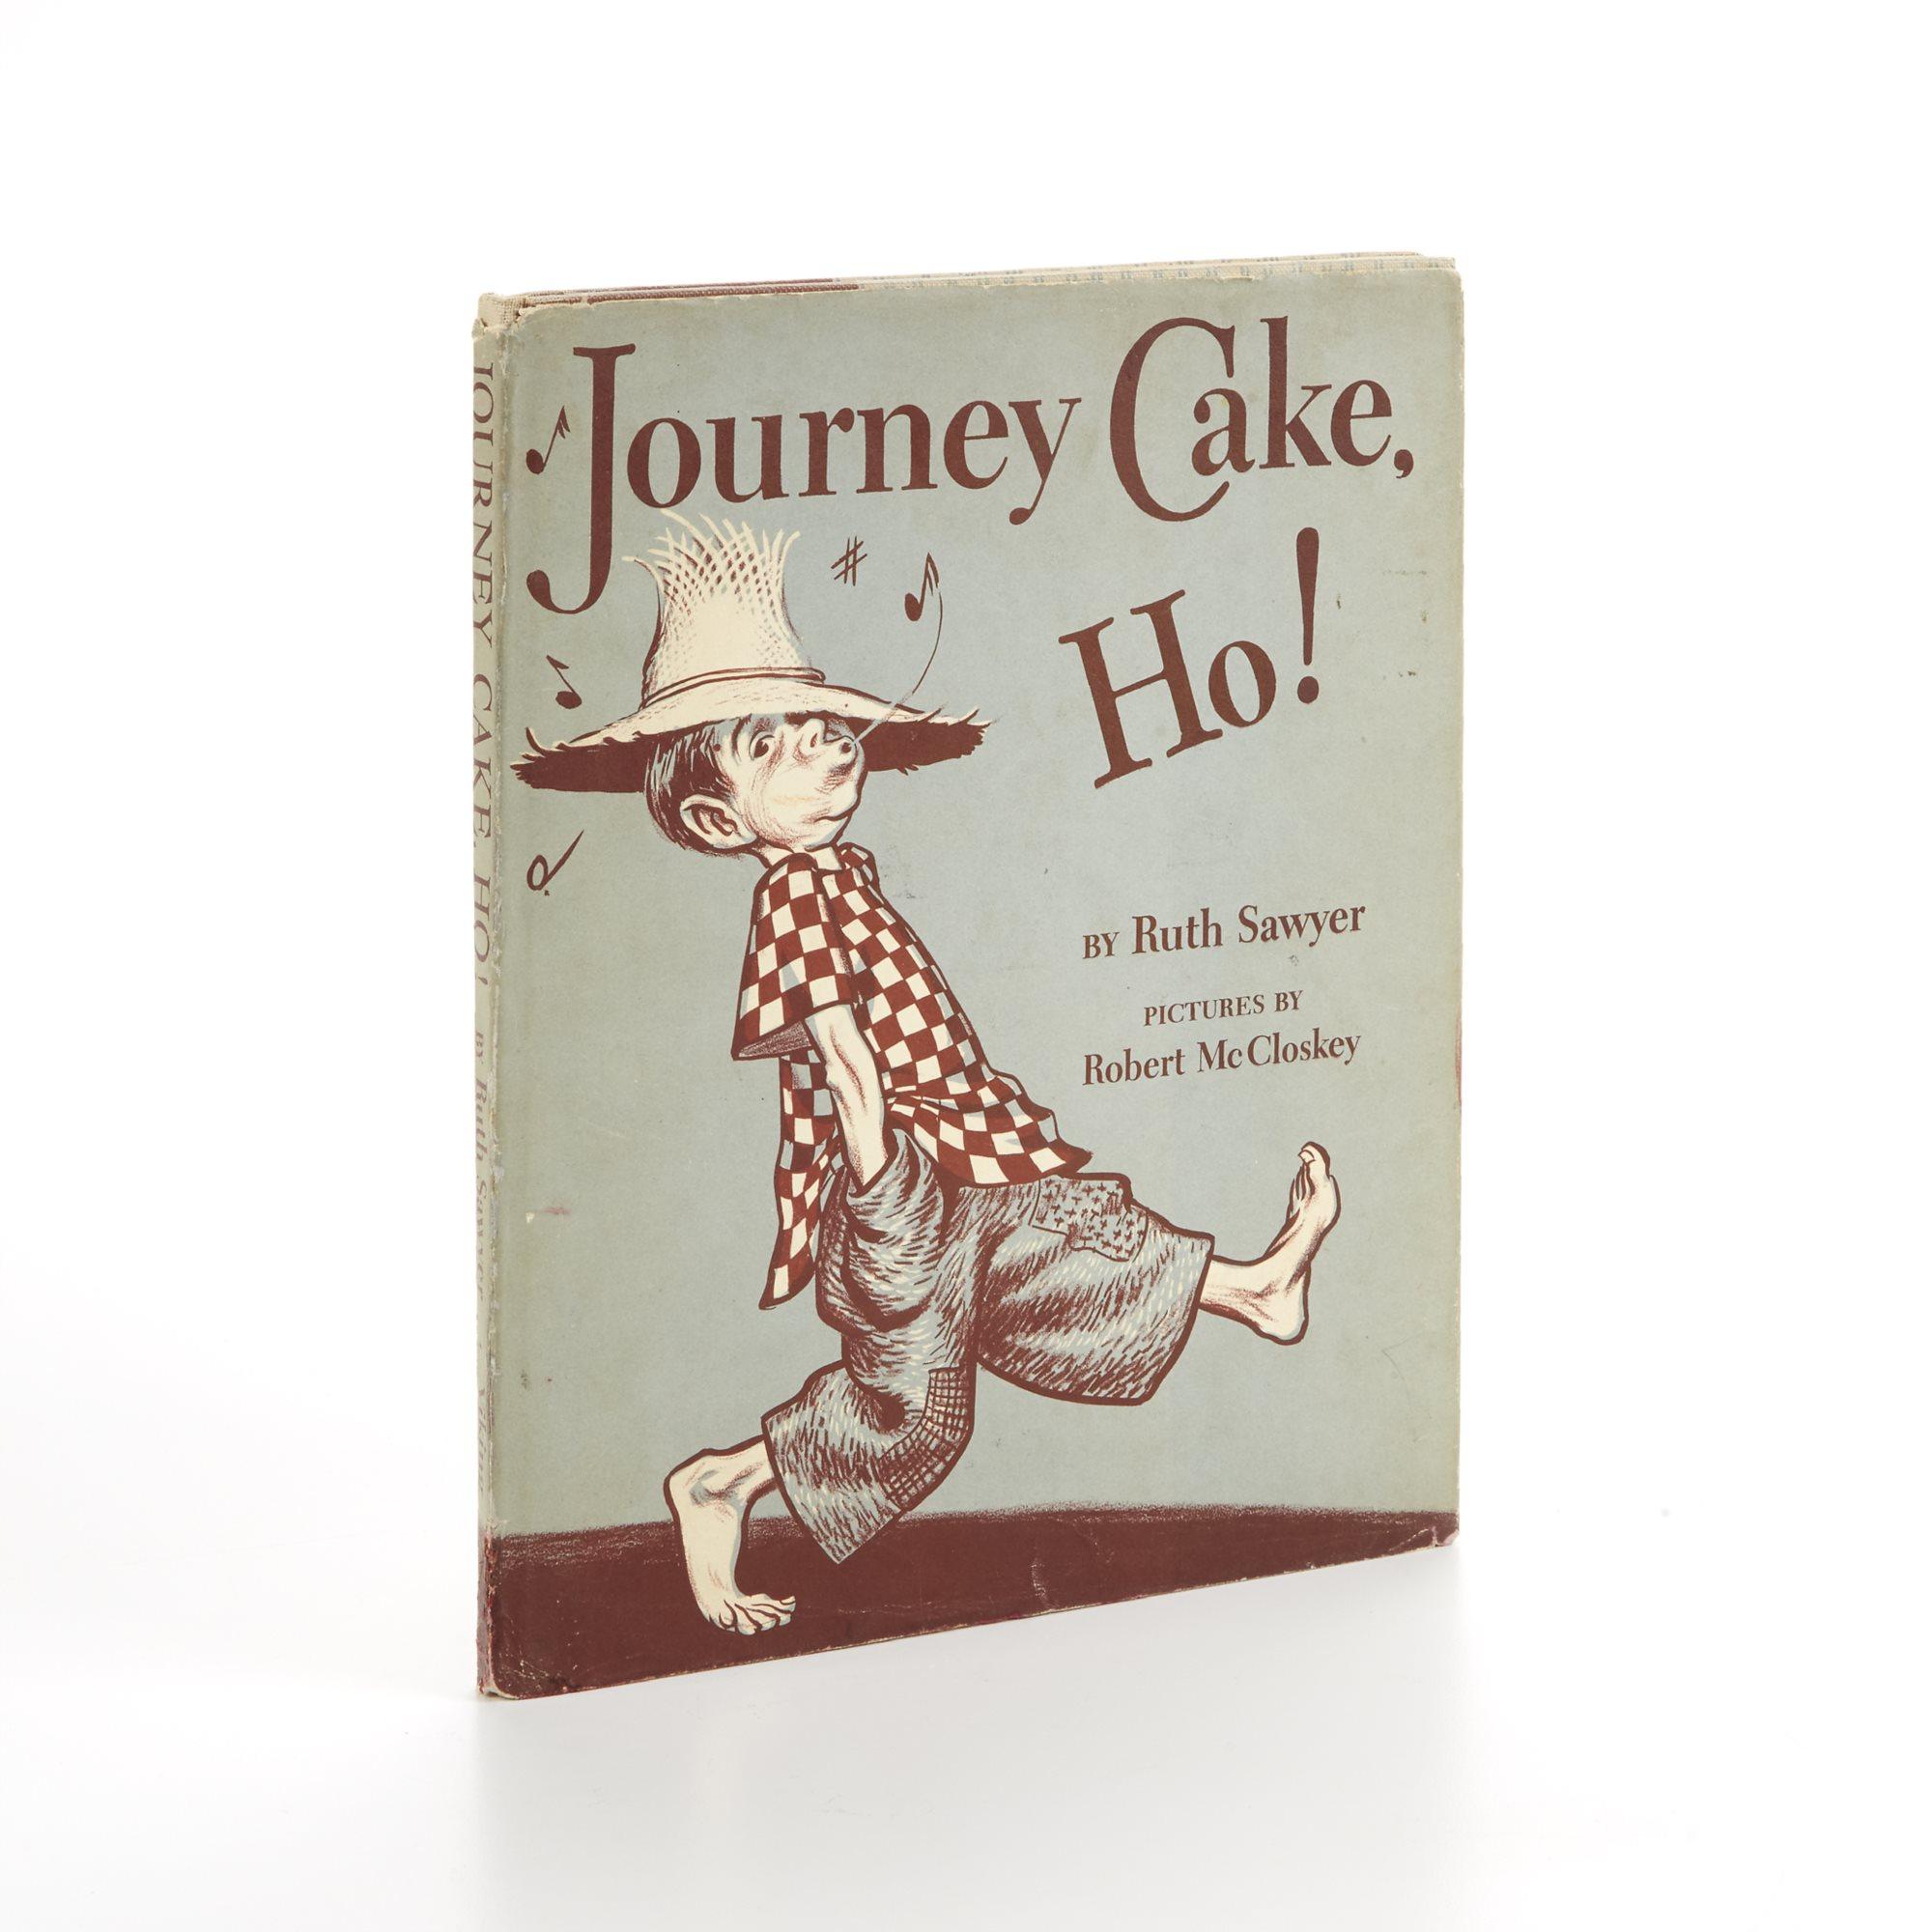 [McCloskey, Robert] Sawyer, Ruth Journey Cake, Ho! New York: The Viking Press, 1953. First edition. A 1954 Caldecott Honor Book.